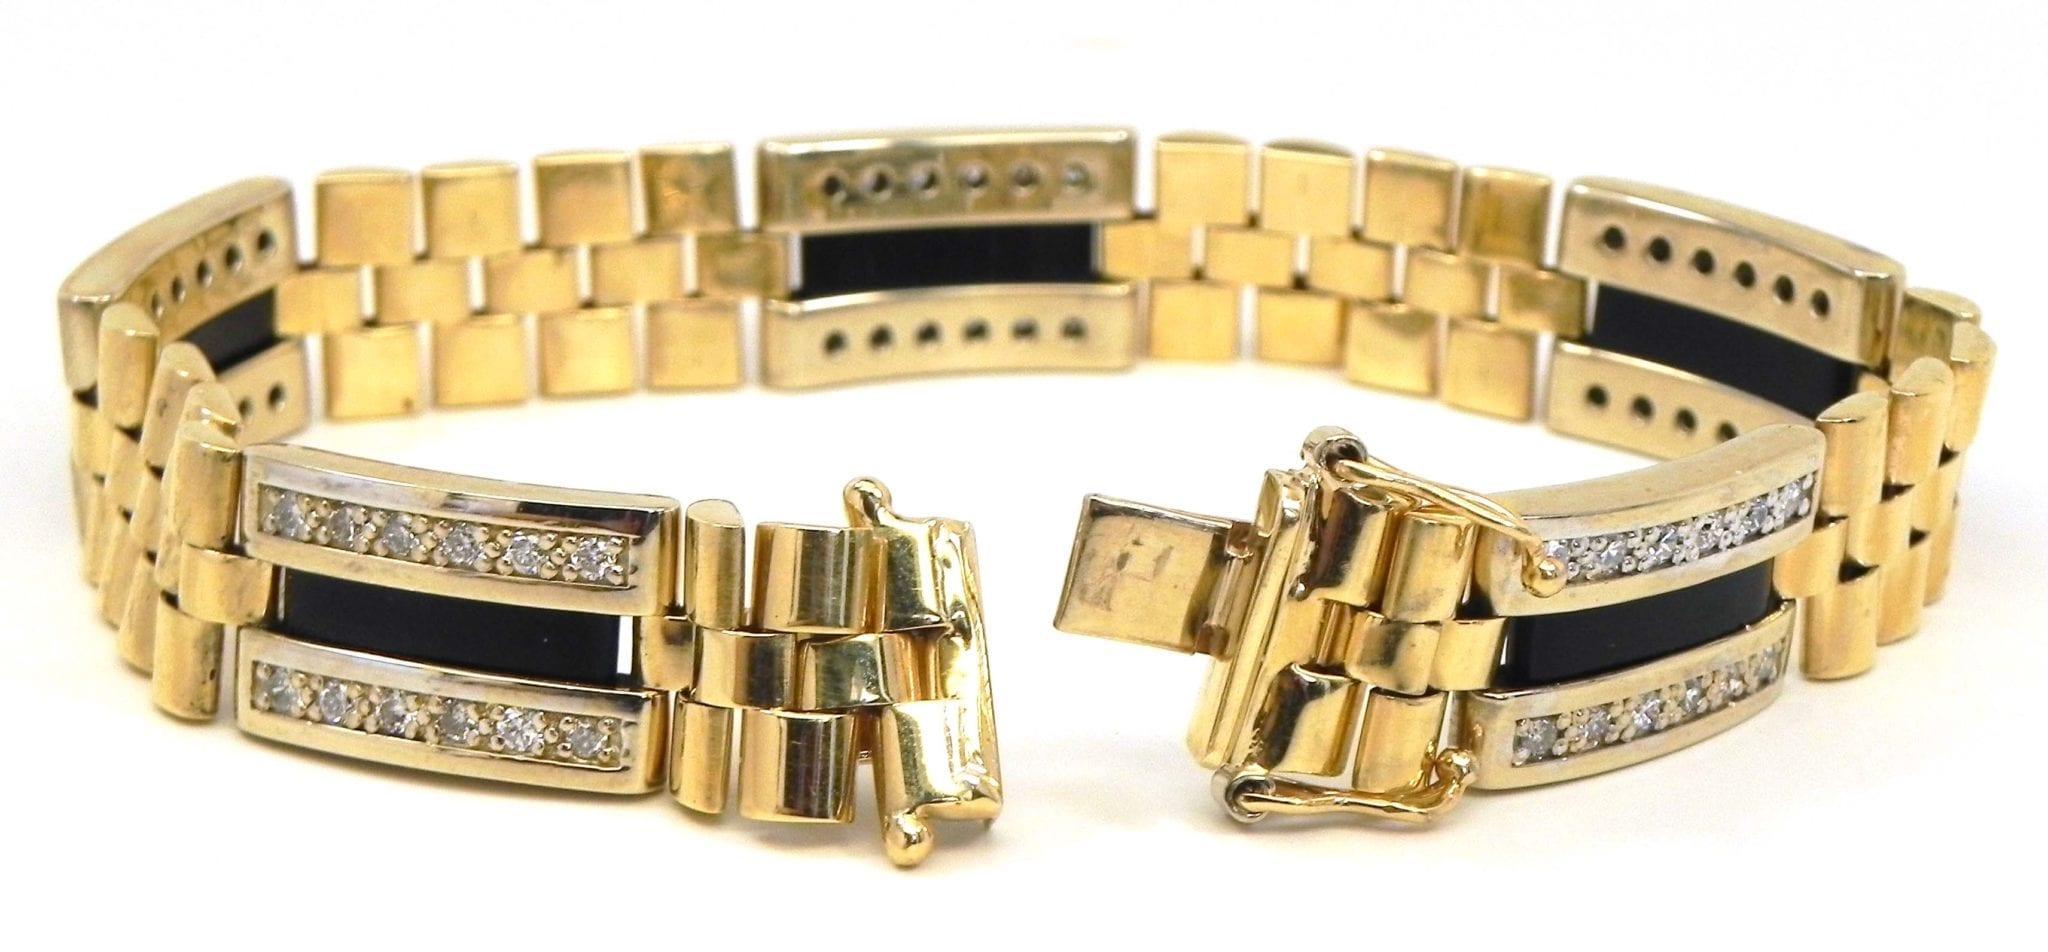 Men's 14k Two-Tone 1.67 Cts. Diamonds & Black Onyx Bracelet | Bright Jewelers